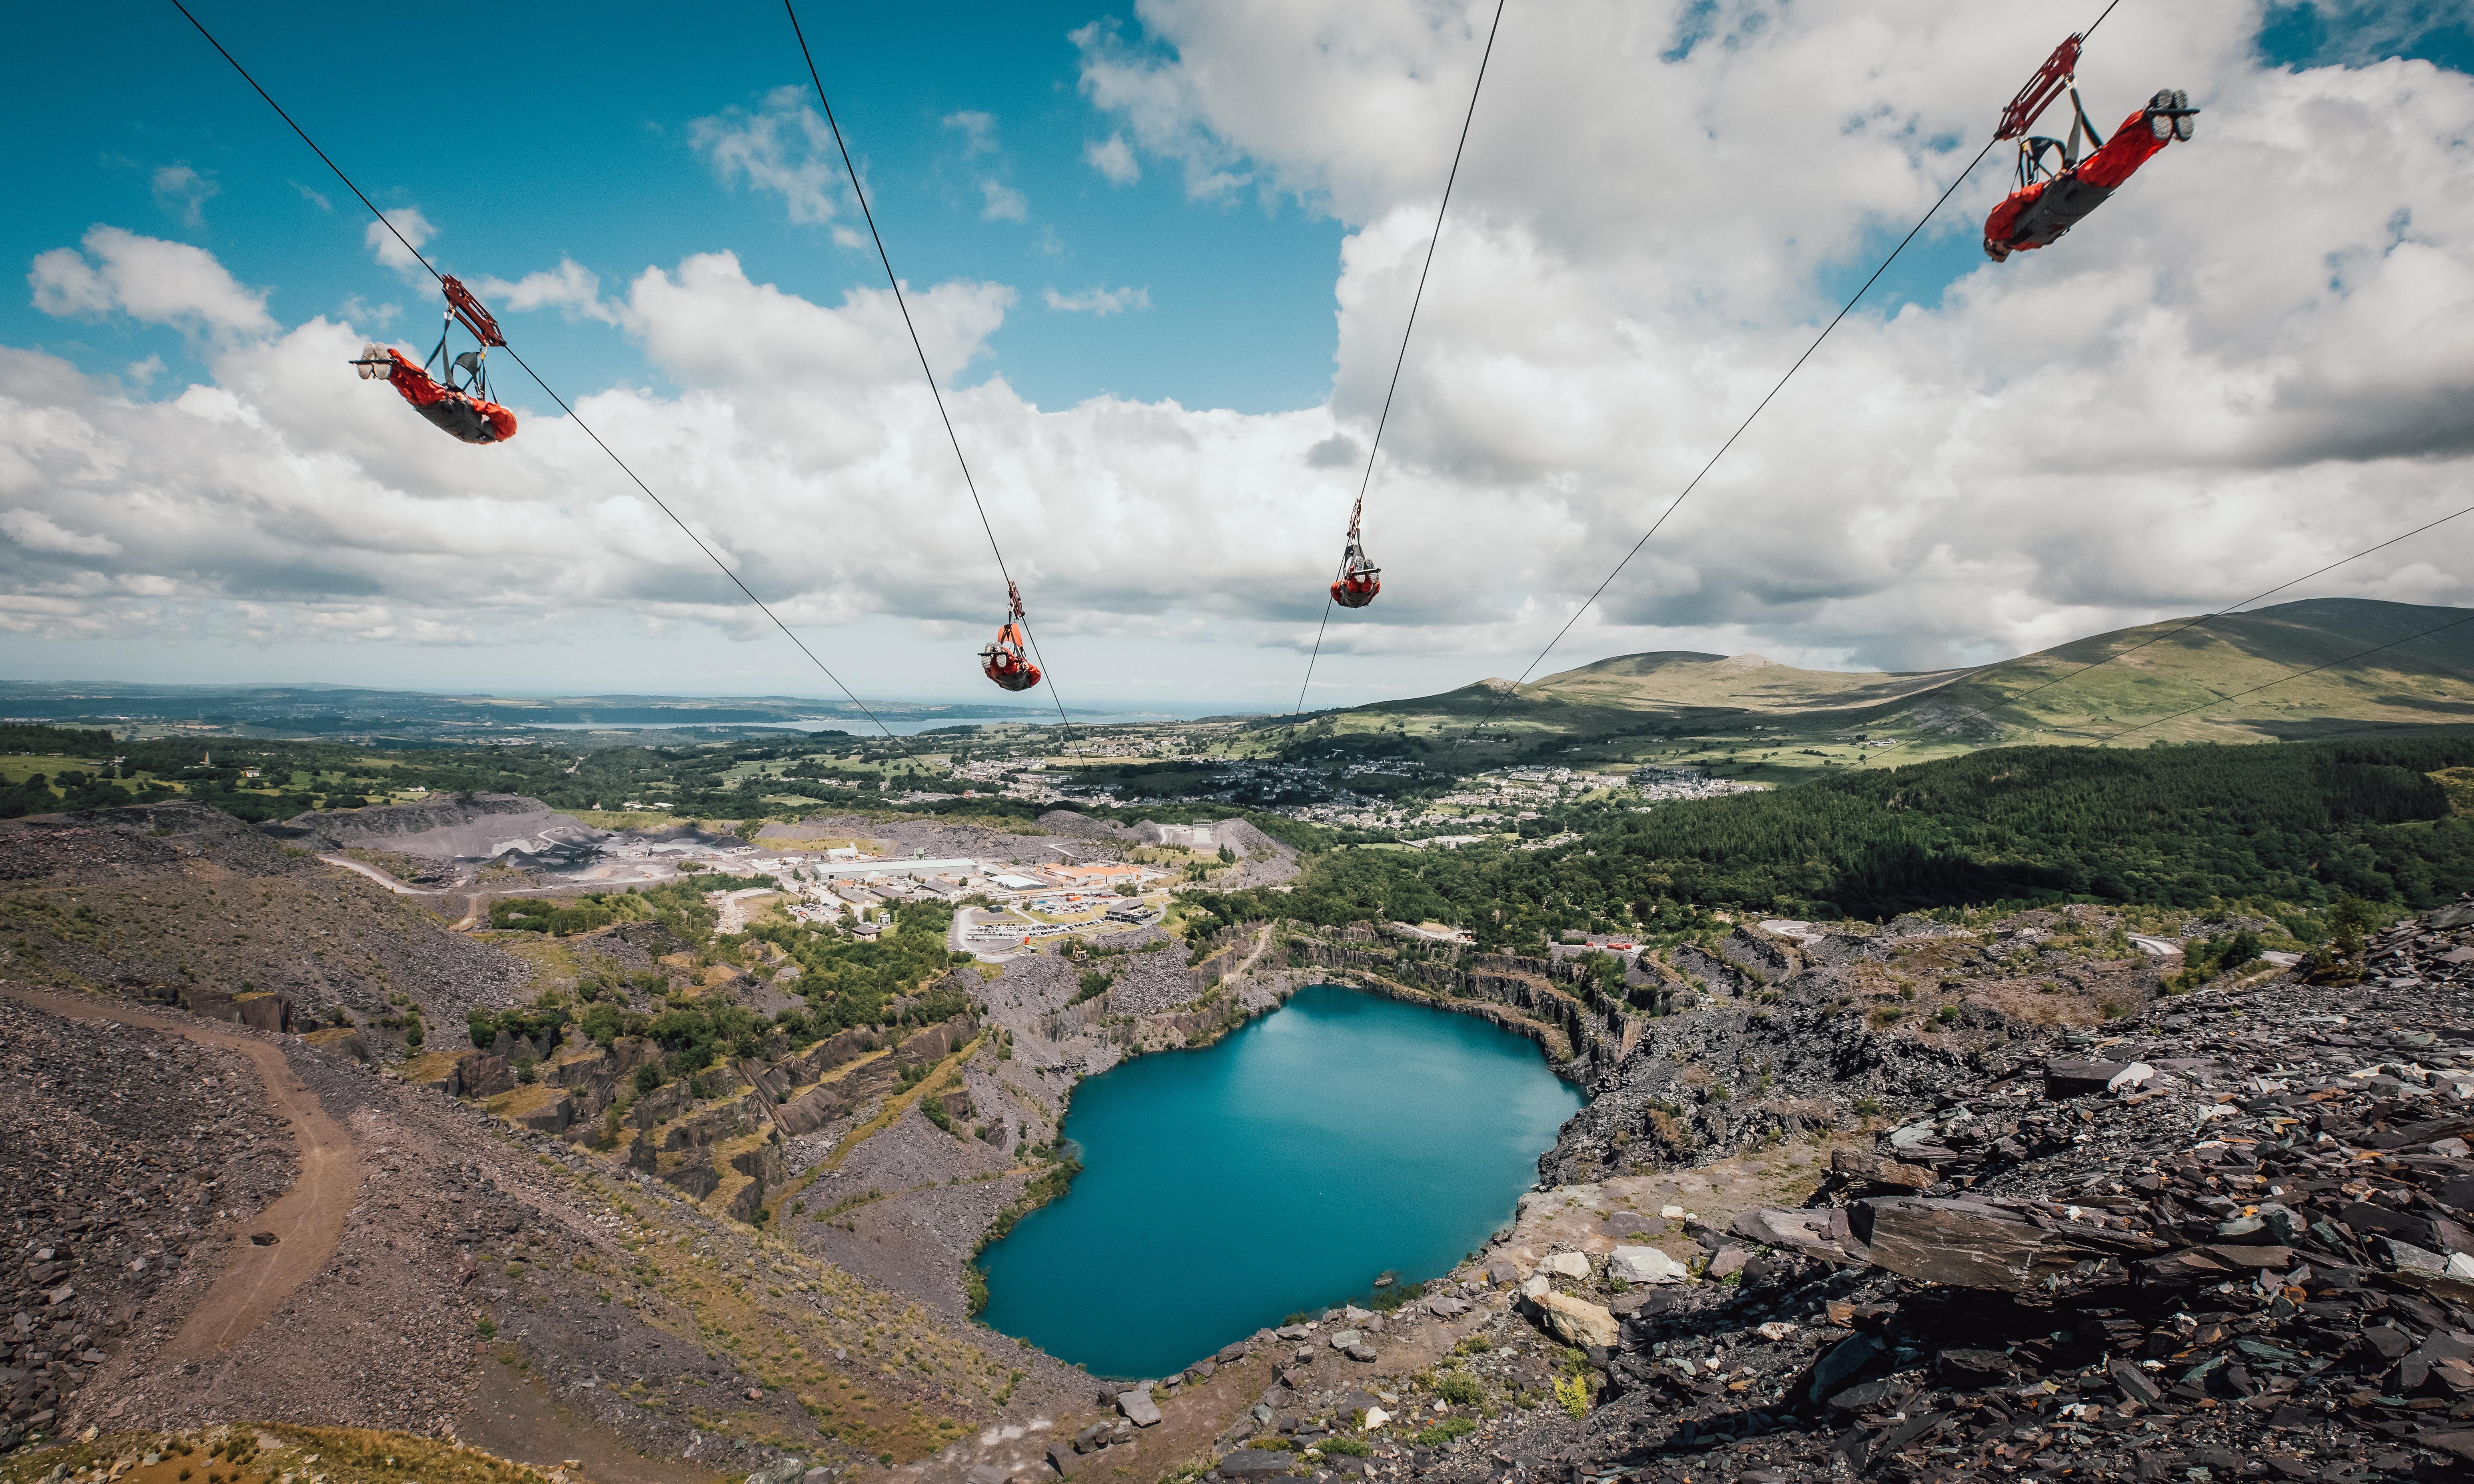 Snowdonia activity break: dream trips for daredevils